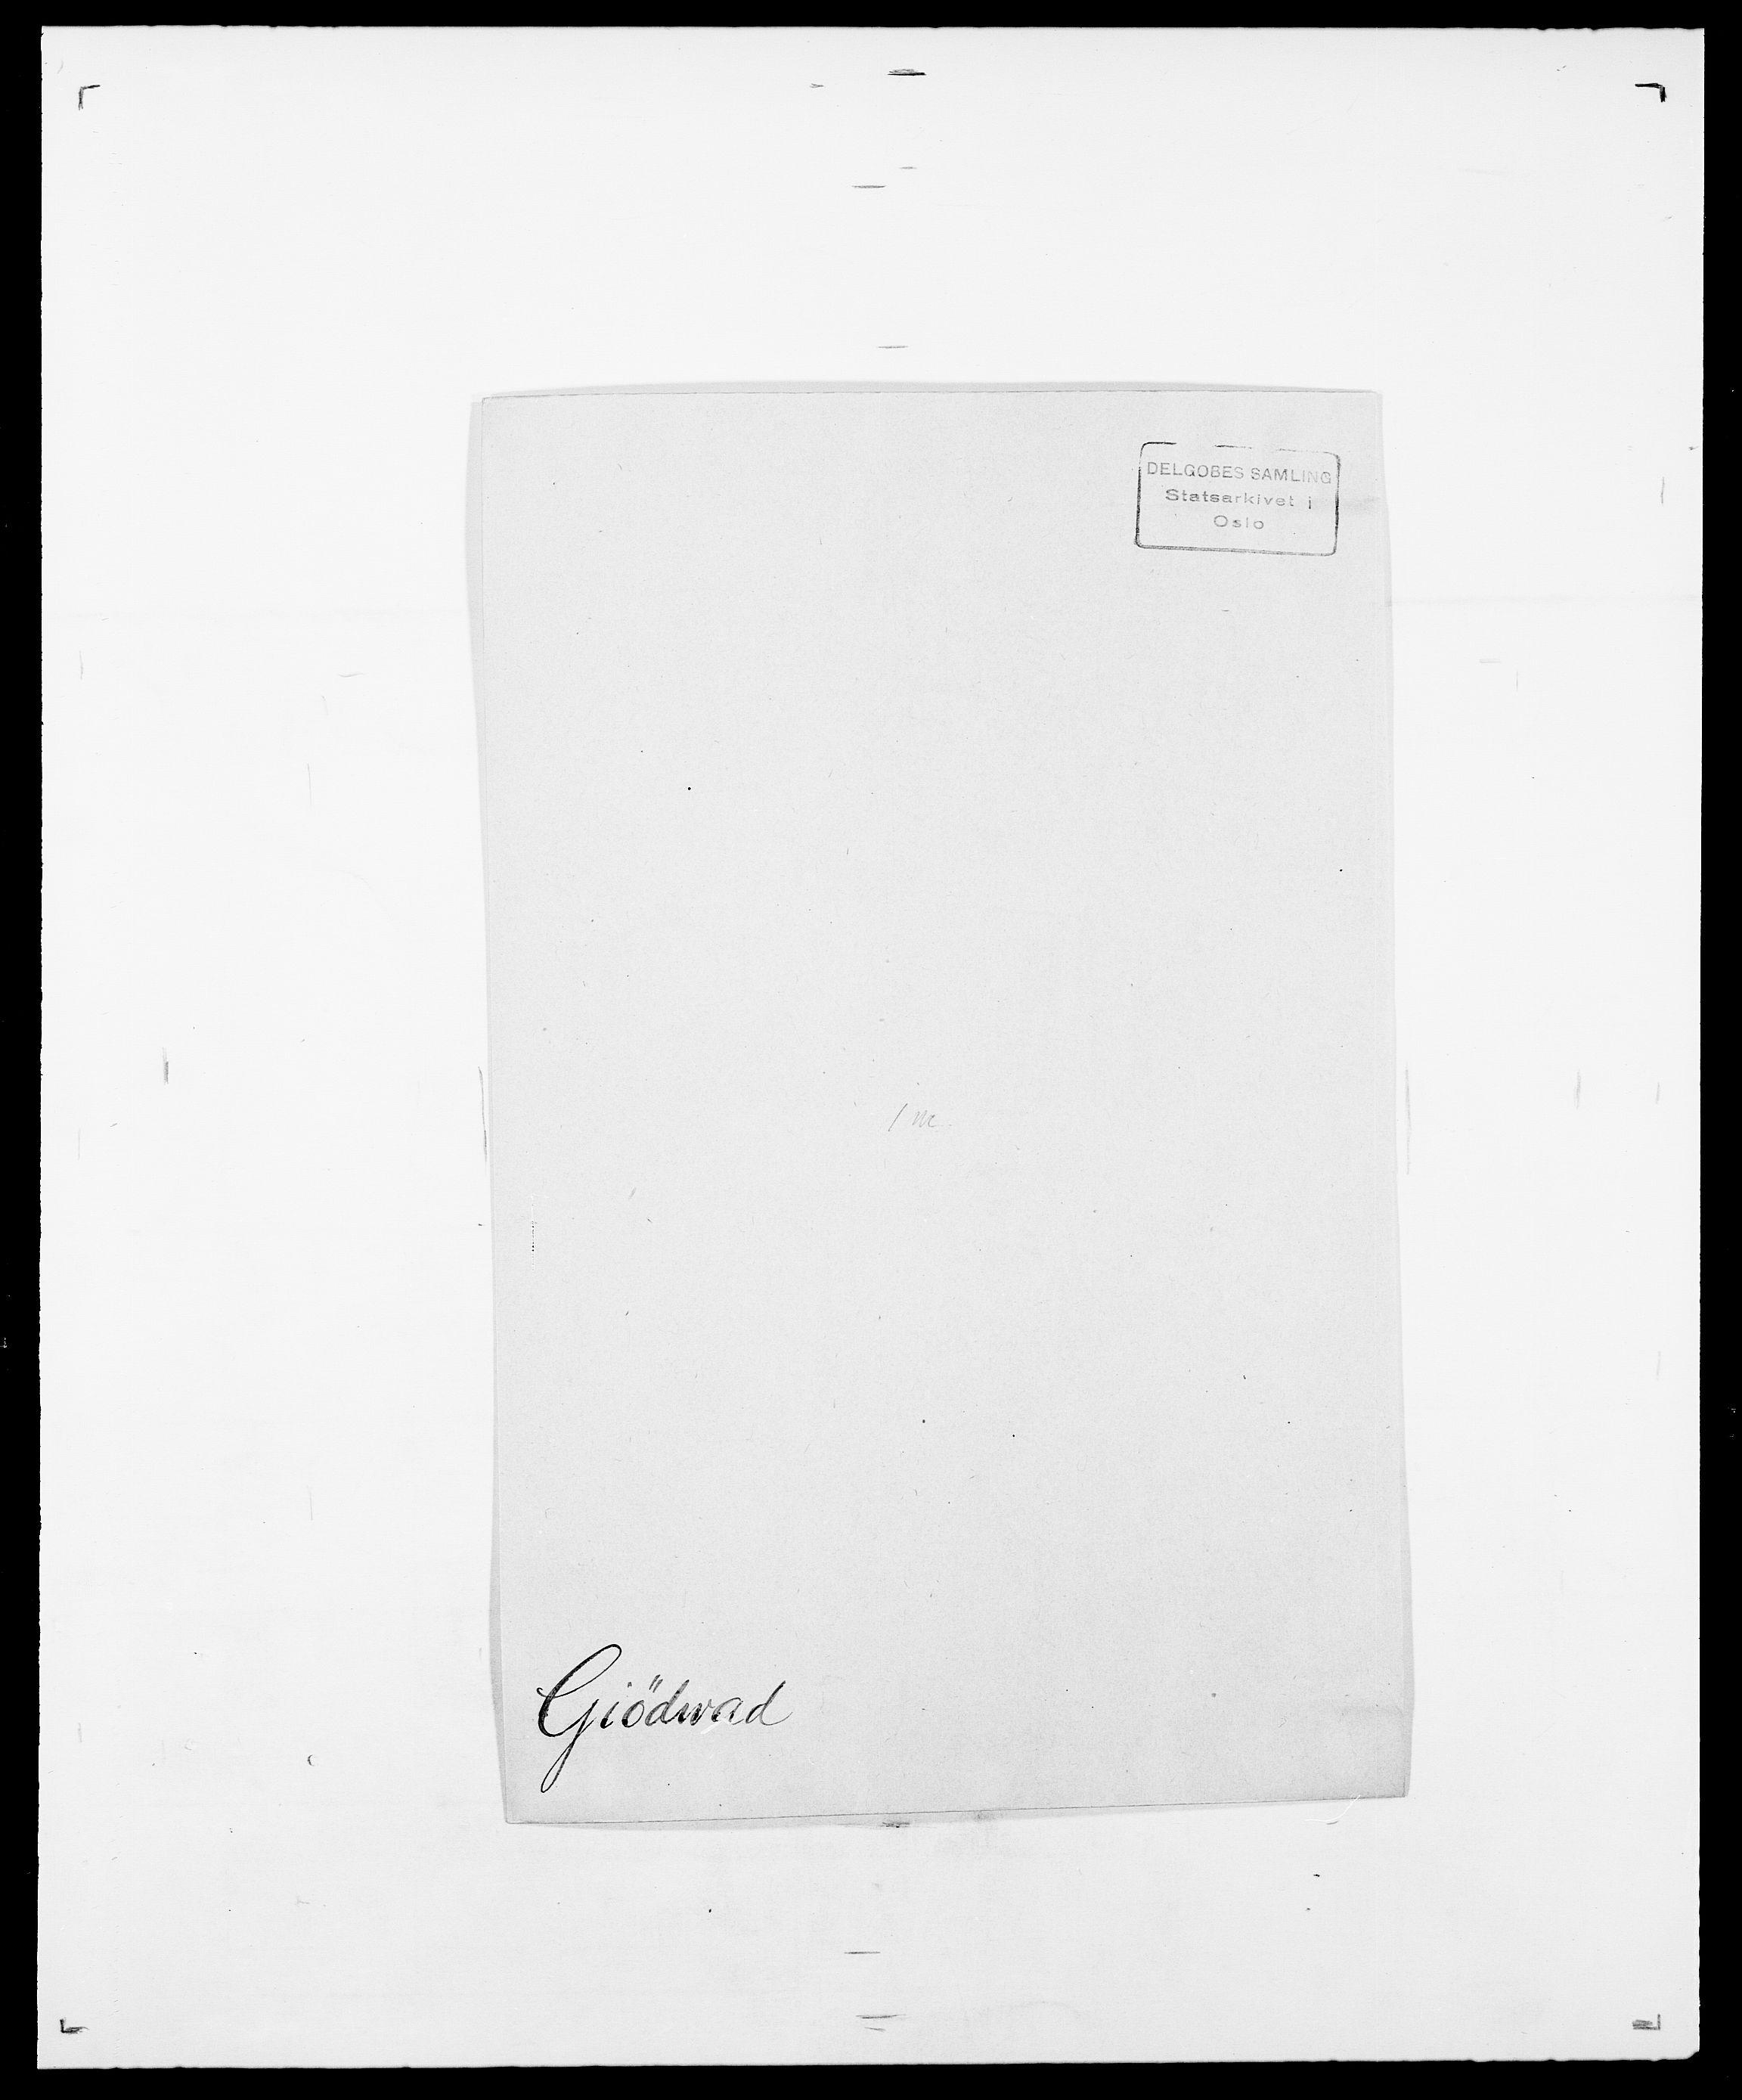 SAO, Delgobe, Charles Antoine - samling, D/Da/L0014: Giebdhausen - Grip, s. 63